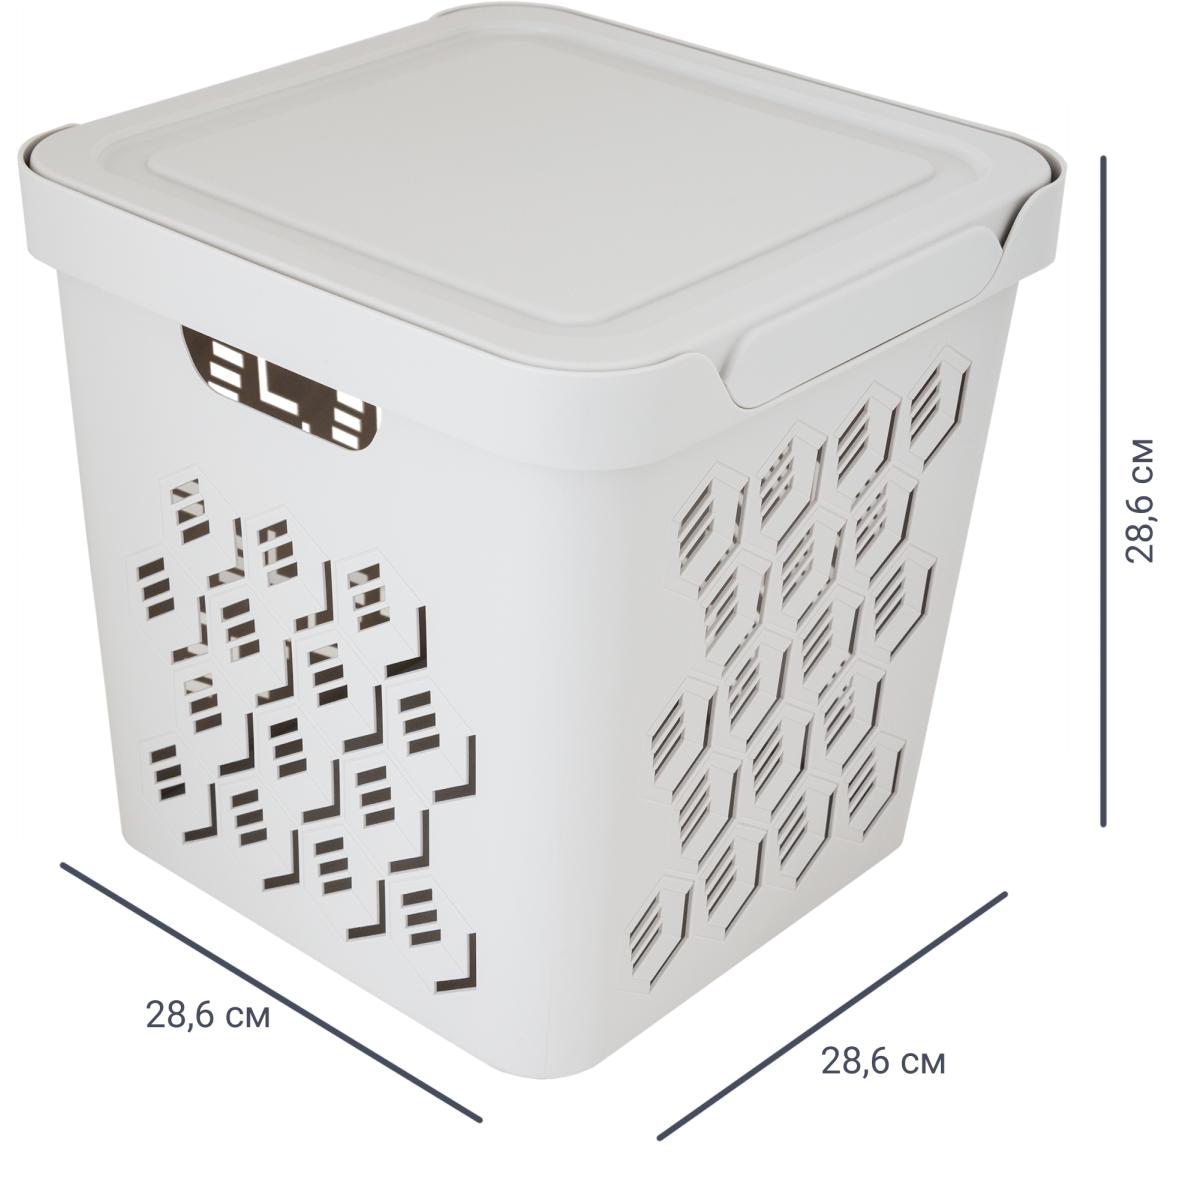 Ящик с крышкой Deluxe 286х286х286 см пластик цвет бежевый